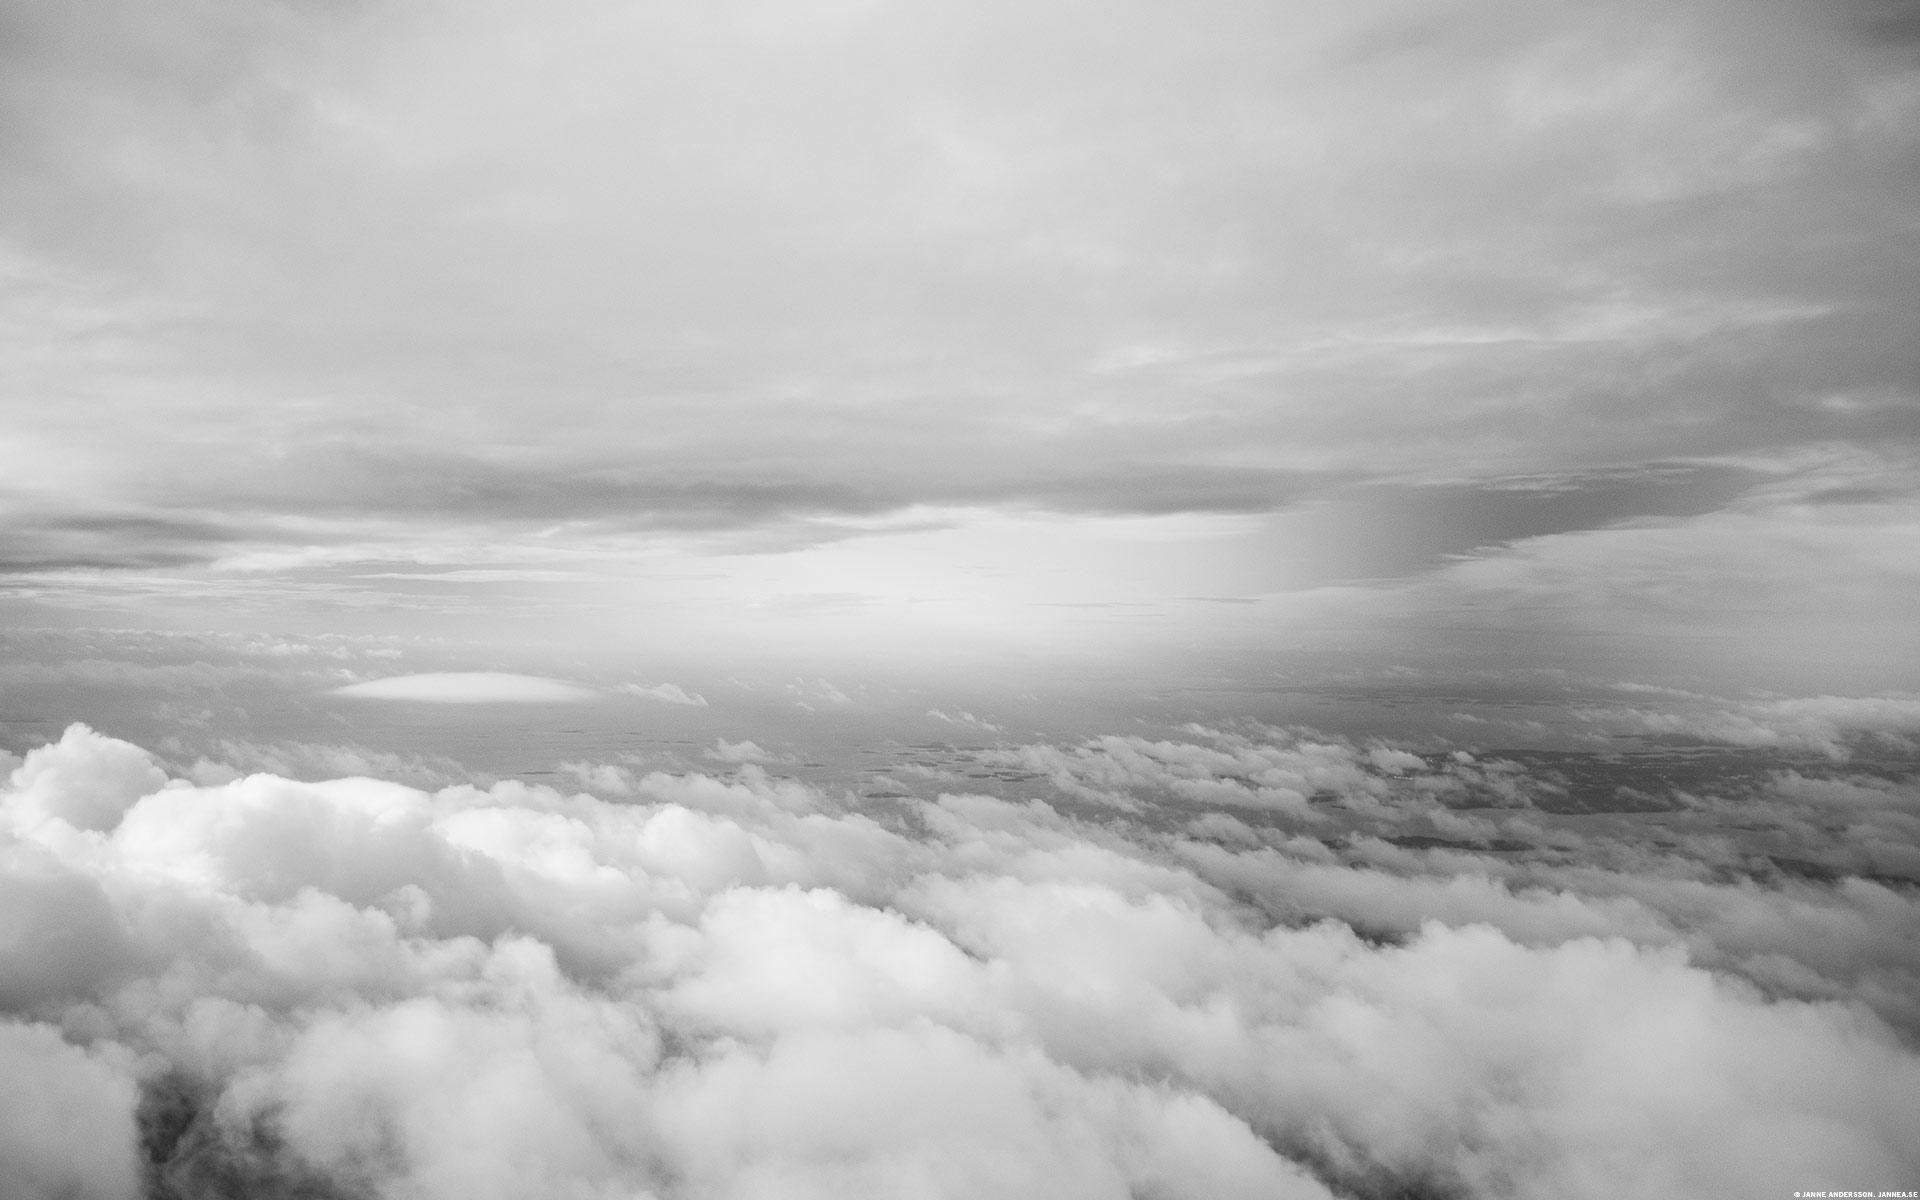 Mellan molnen, högt däruppe| @Janne A